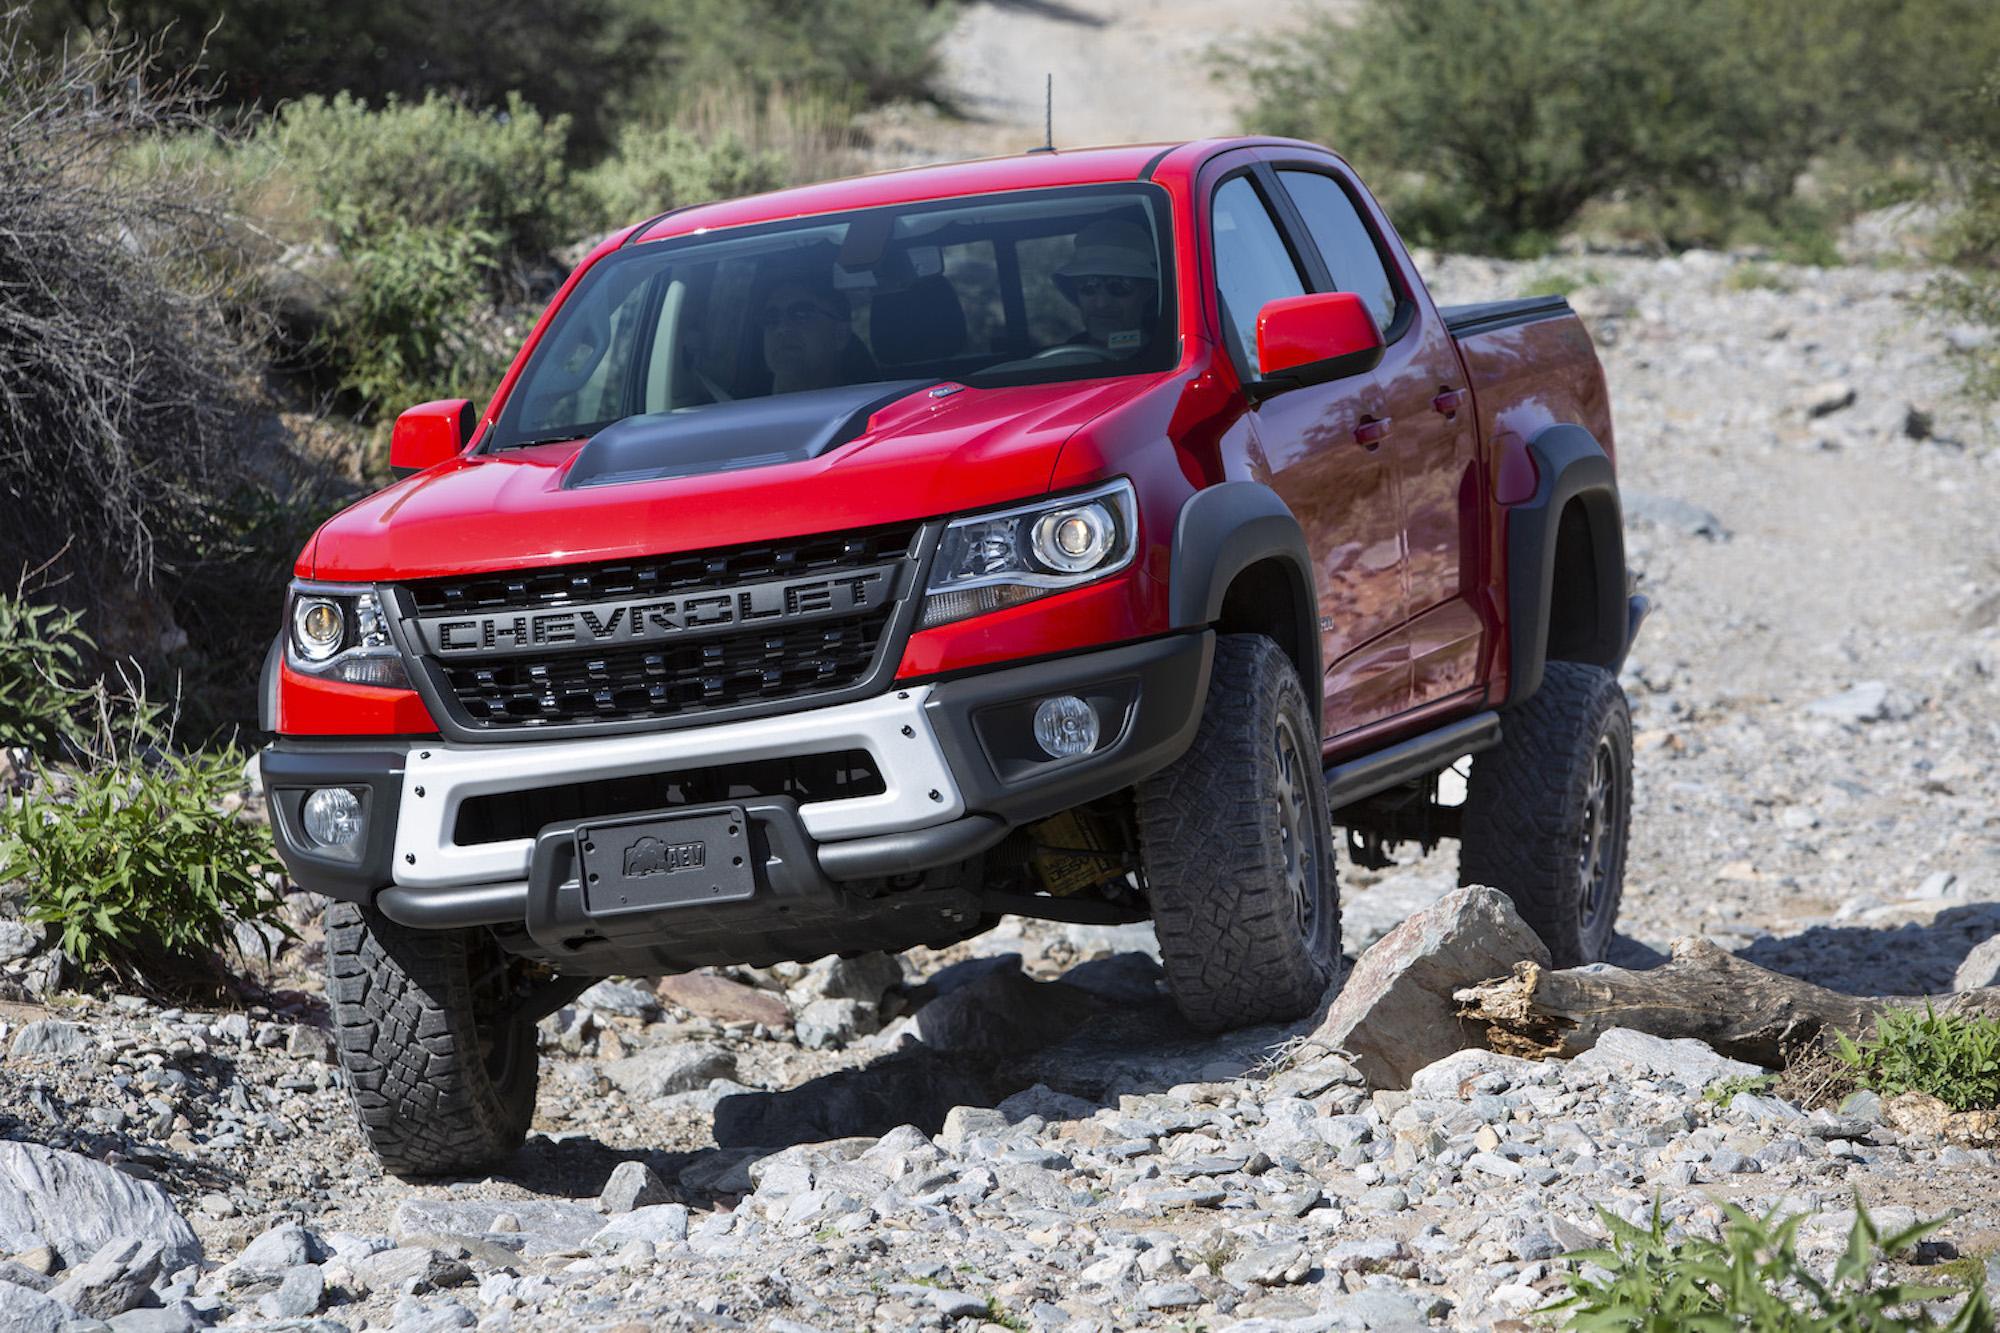 2019 Chevrolet Colorado ZR2 Bison front three-quarter articulation off-road